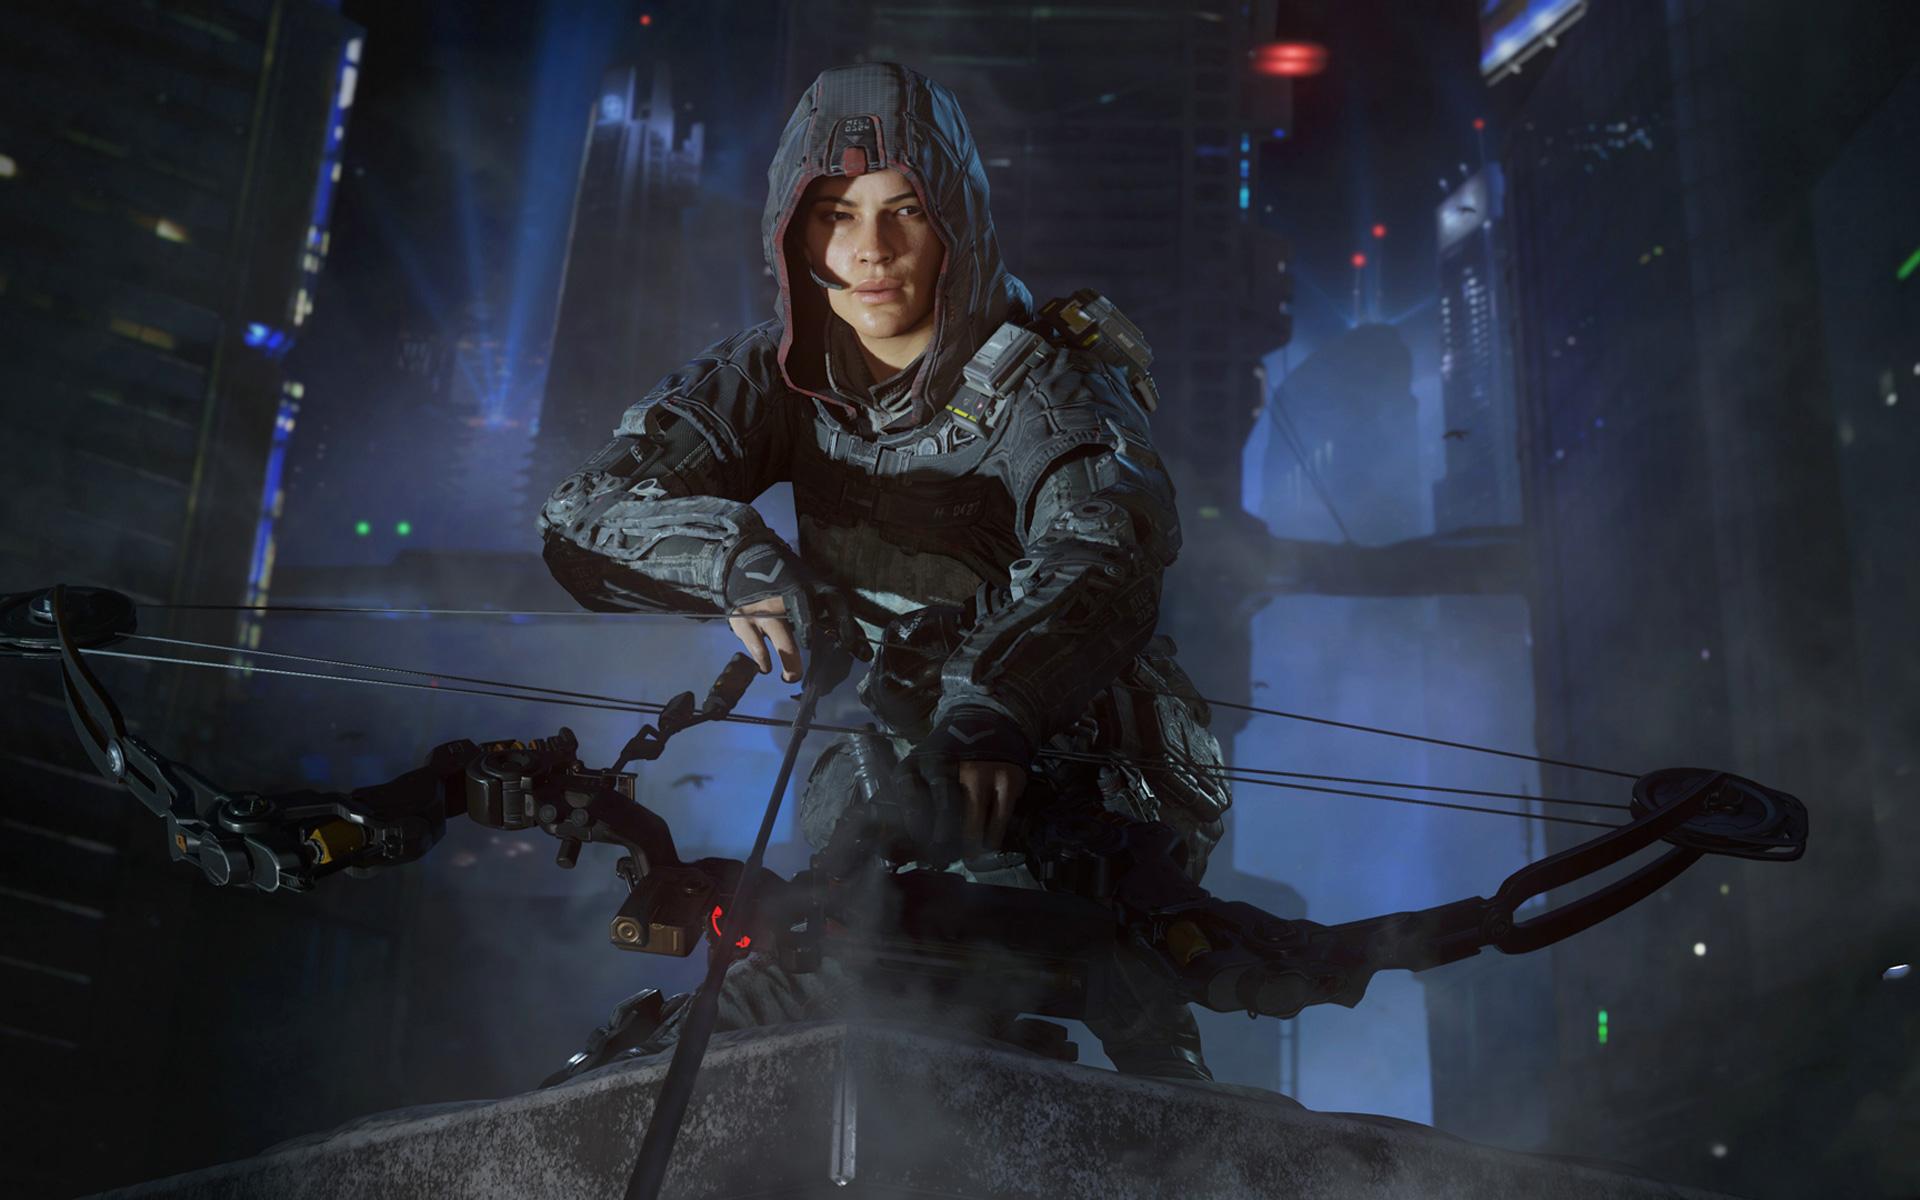 Call of Duty: Black Ops III Wallpaper in 1920x1200